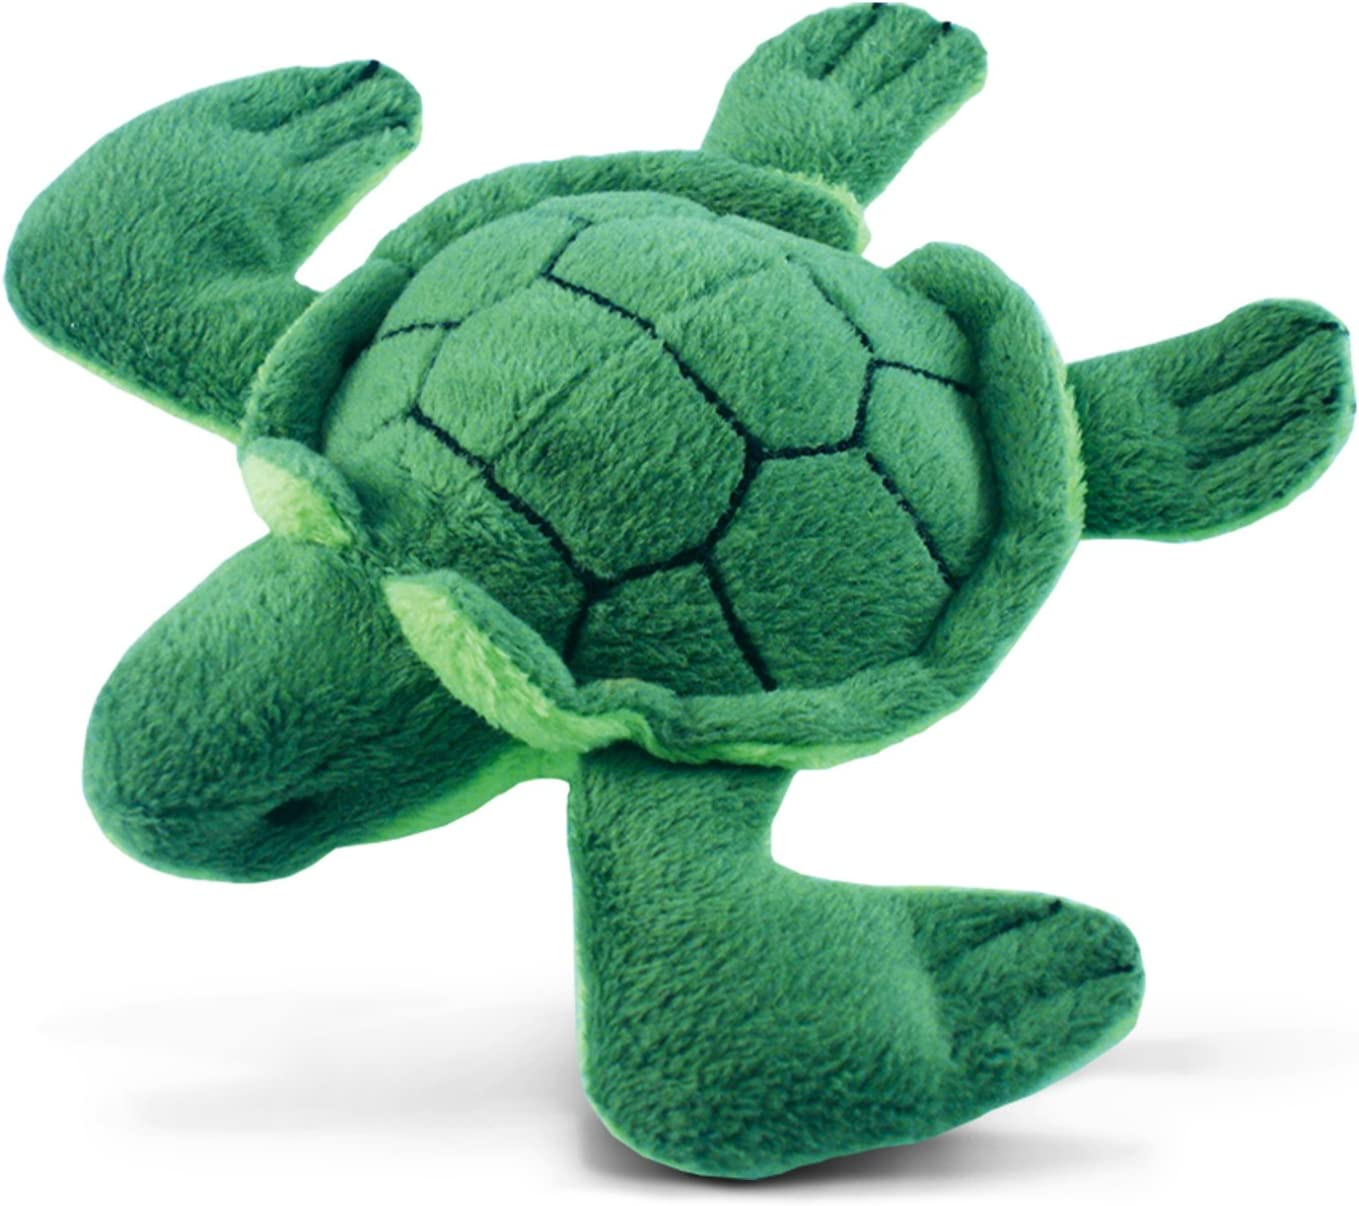 CoTa Global Sea Turtle Plush Refrigerator Magnet - Green Tortoise Stuffed Plush Magnet, Cute Ocean Life Magnet For Kitchen Fridge & Locker, Home Decor & Office Decorative Novelty Accessory - 4 Inch